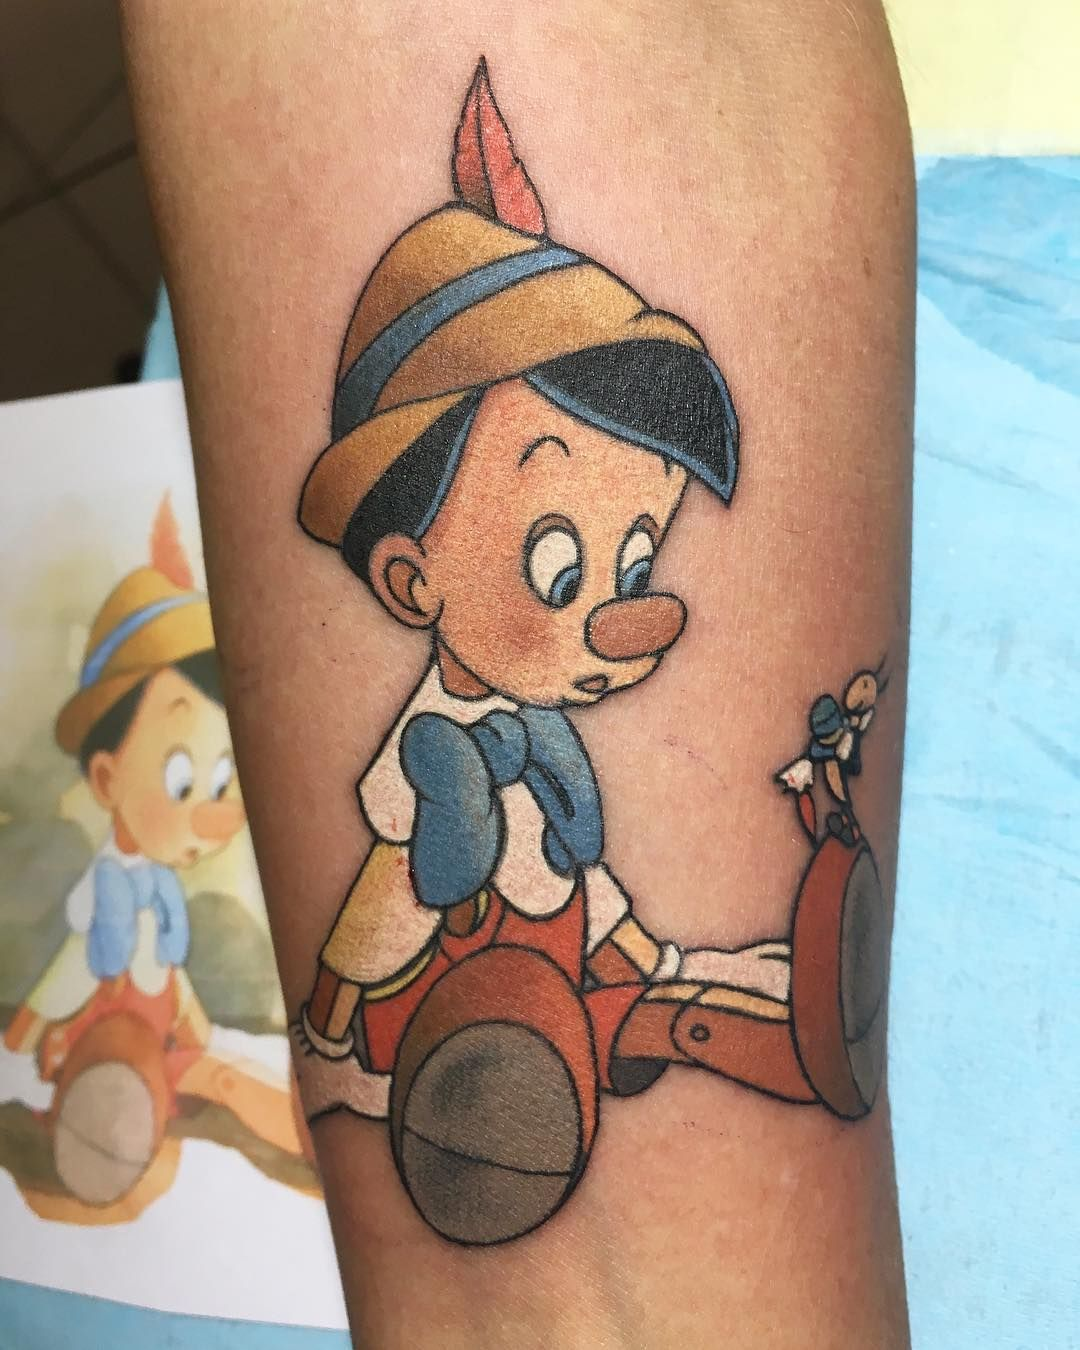 Tatouage Pinocchio Tattoos Disney Tattoos Tattoos Tattoo Designs